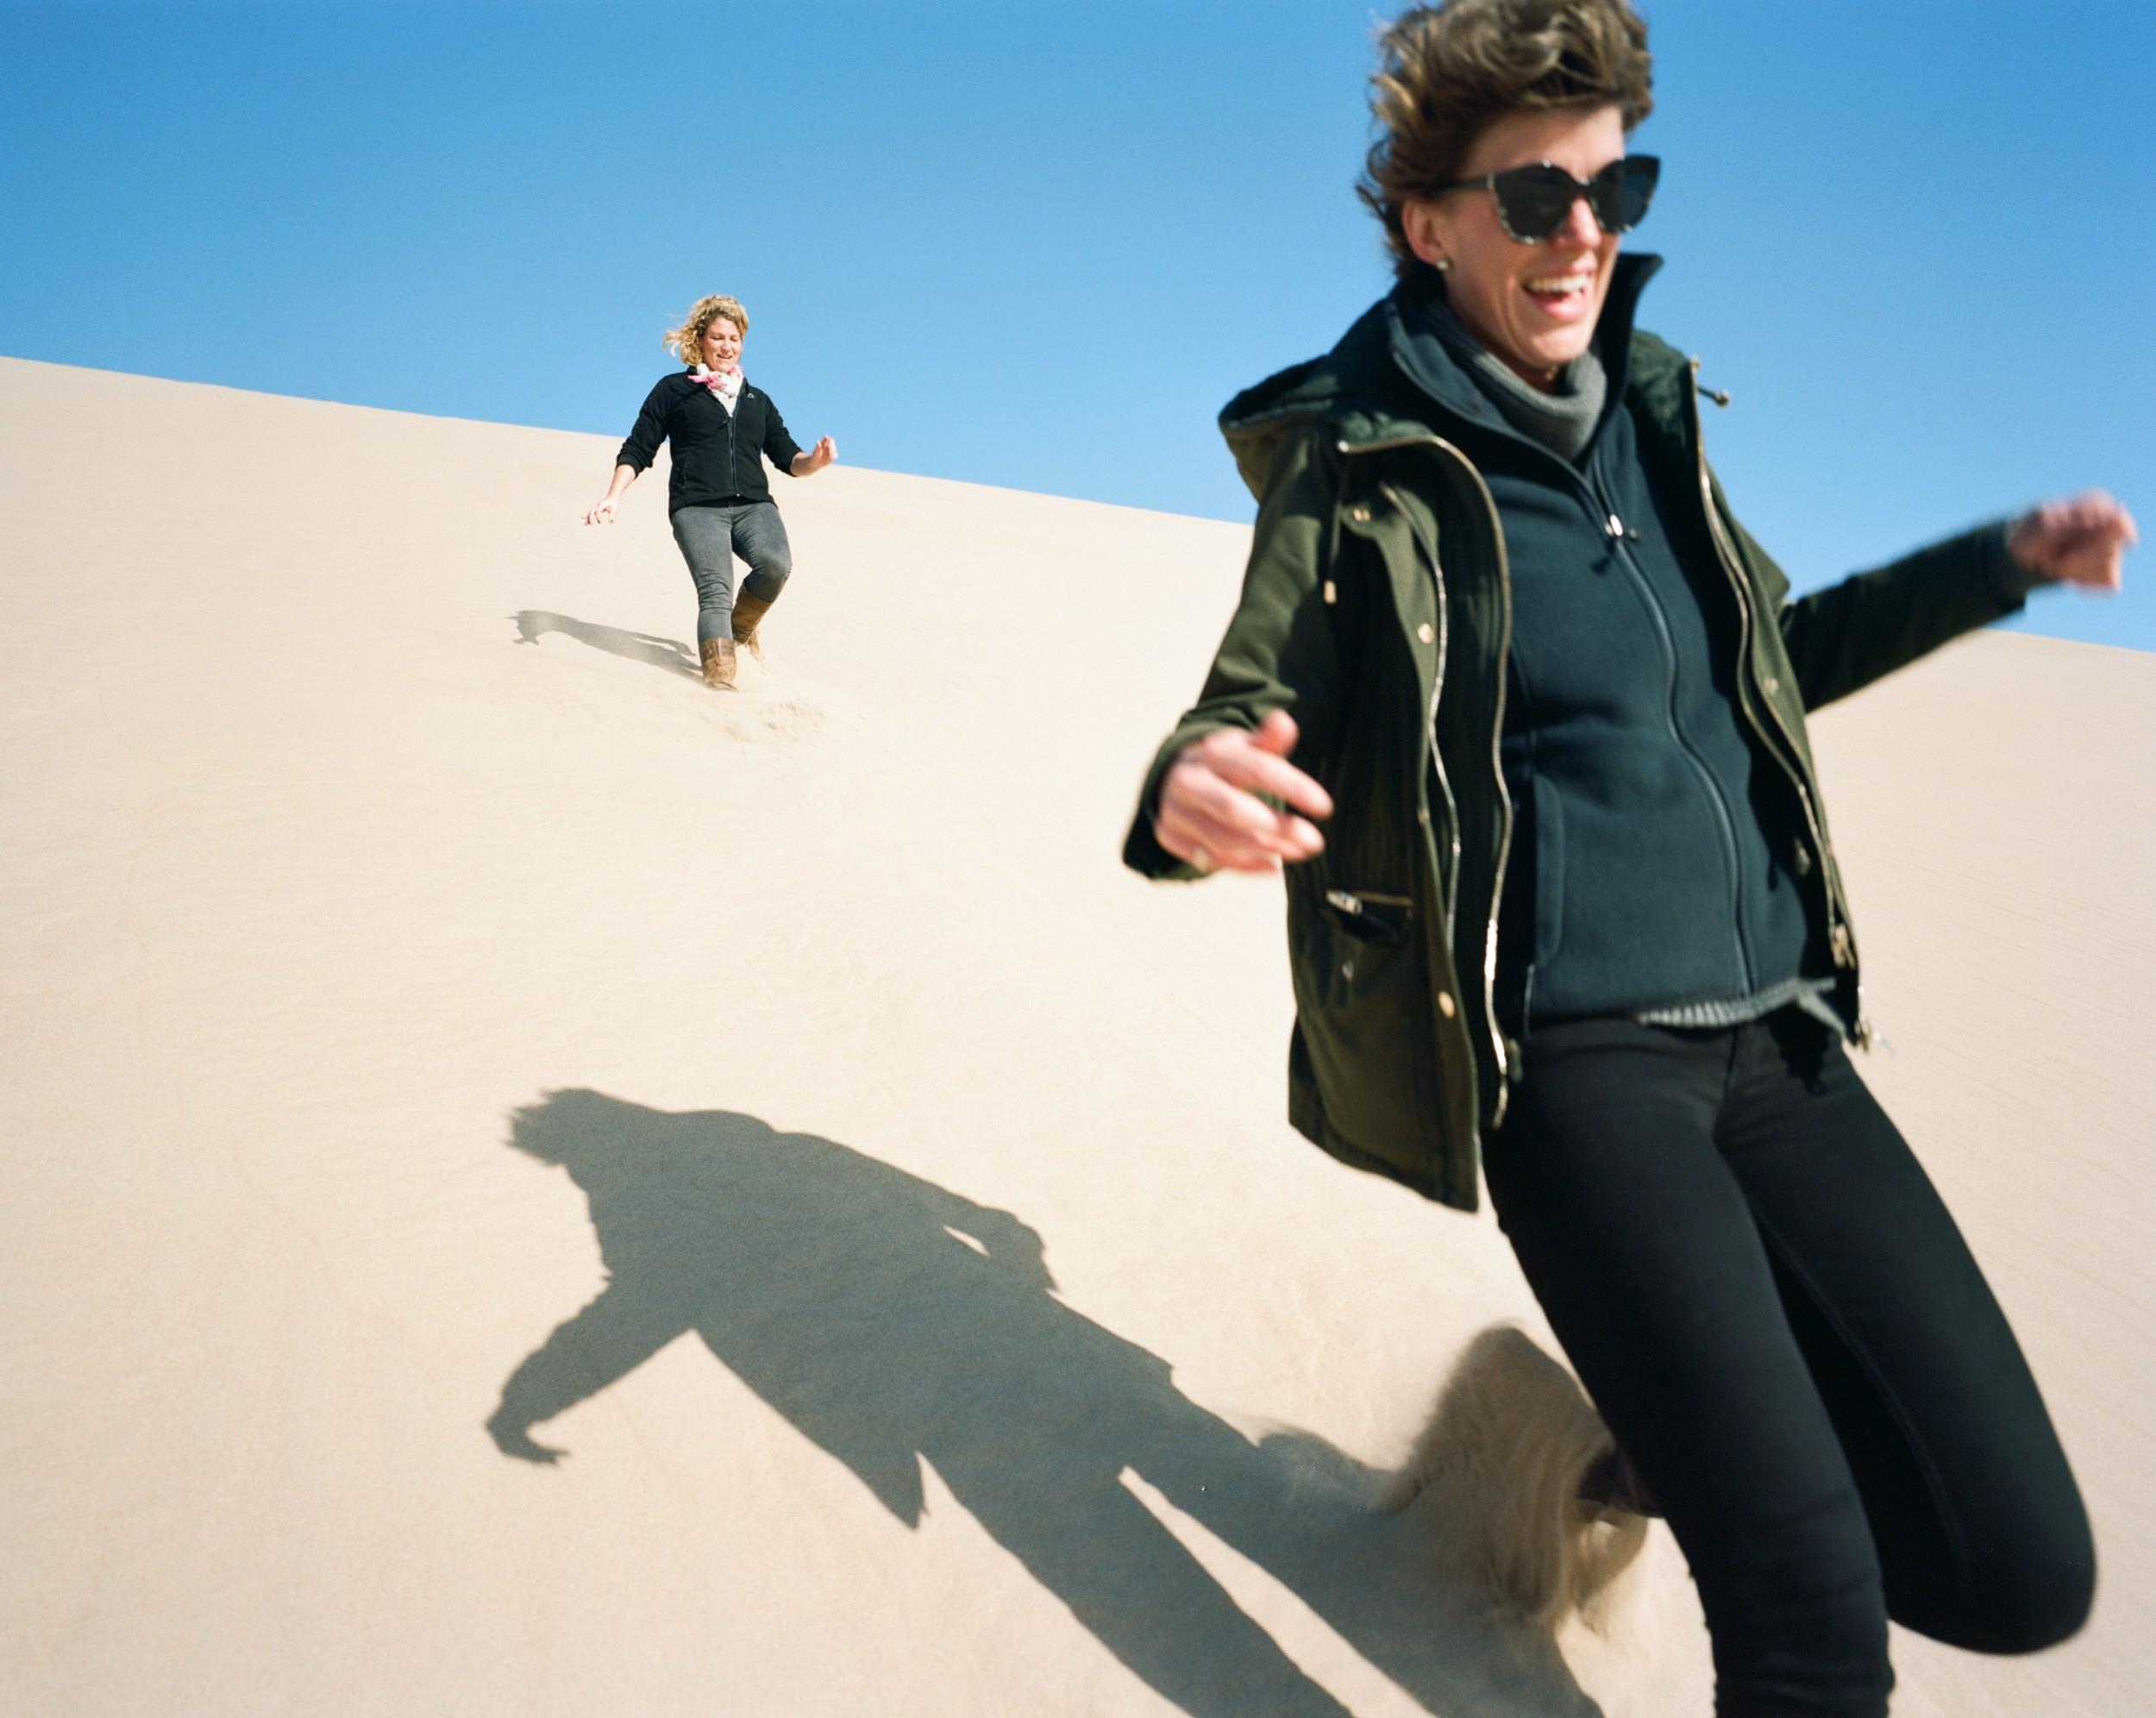 23Shipwreck Lodge - Activities - Dune climbing7.jpg